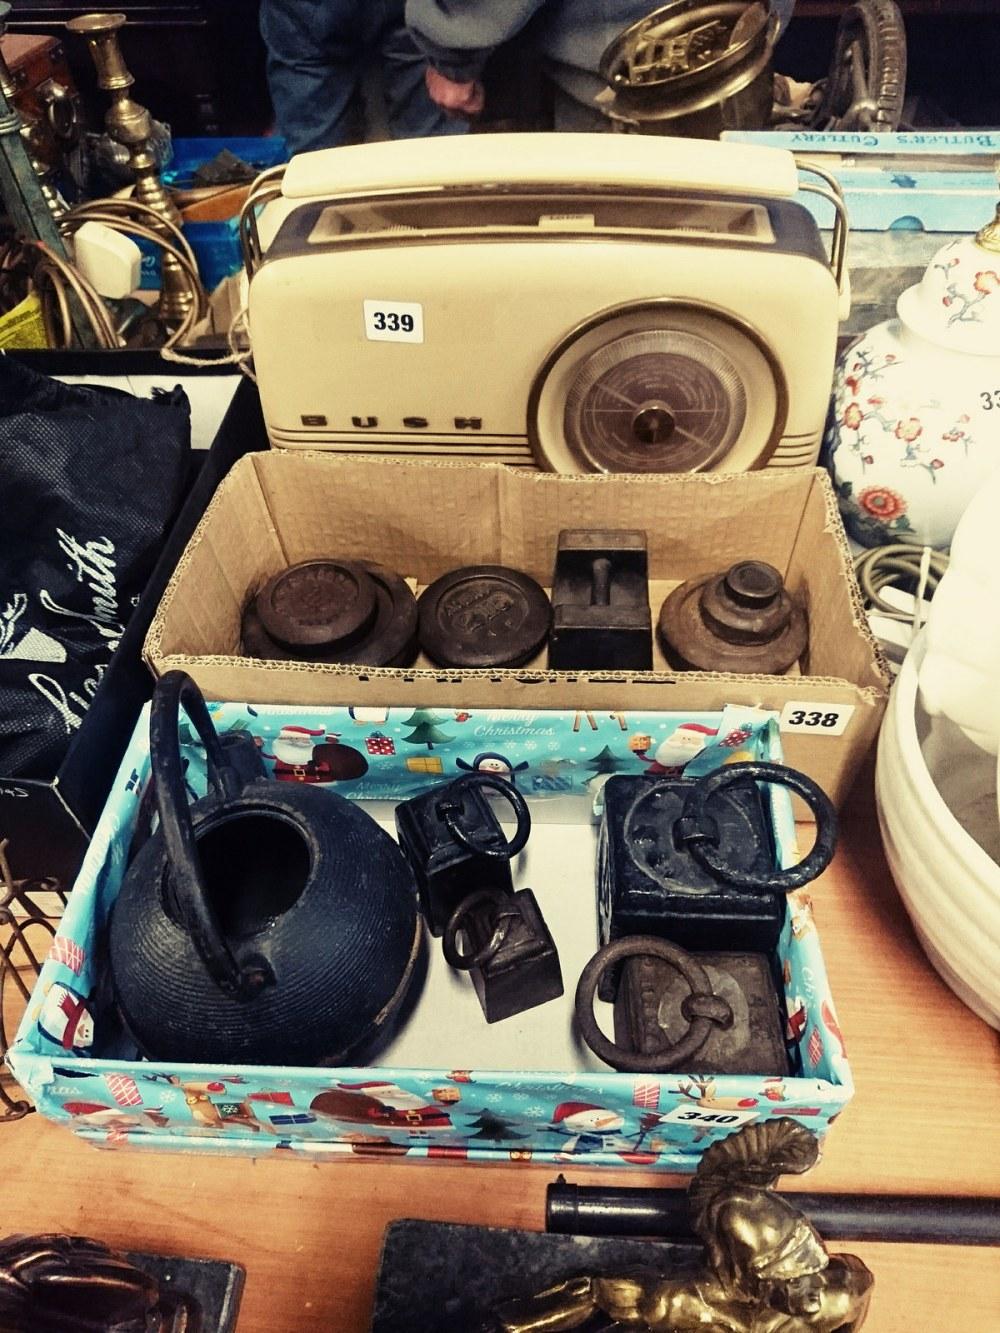 Bush radio and weights